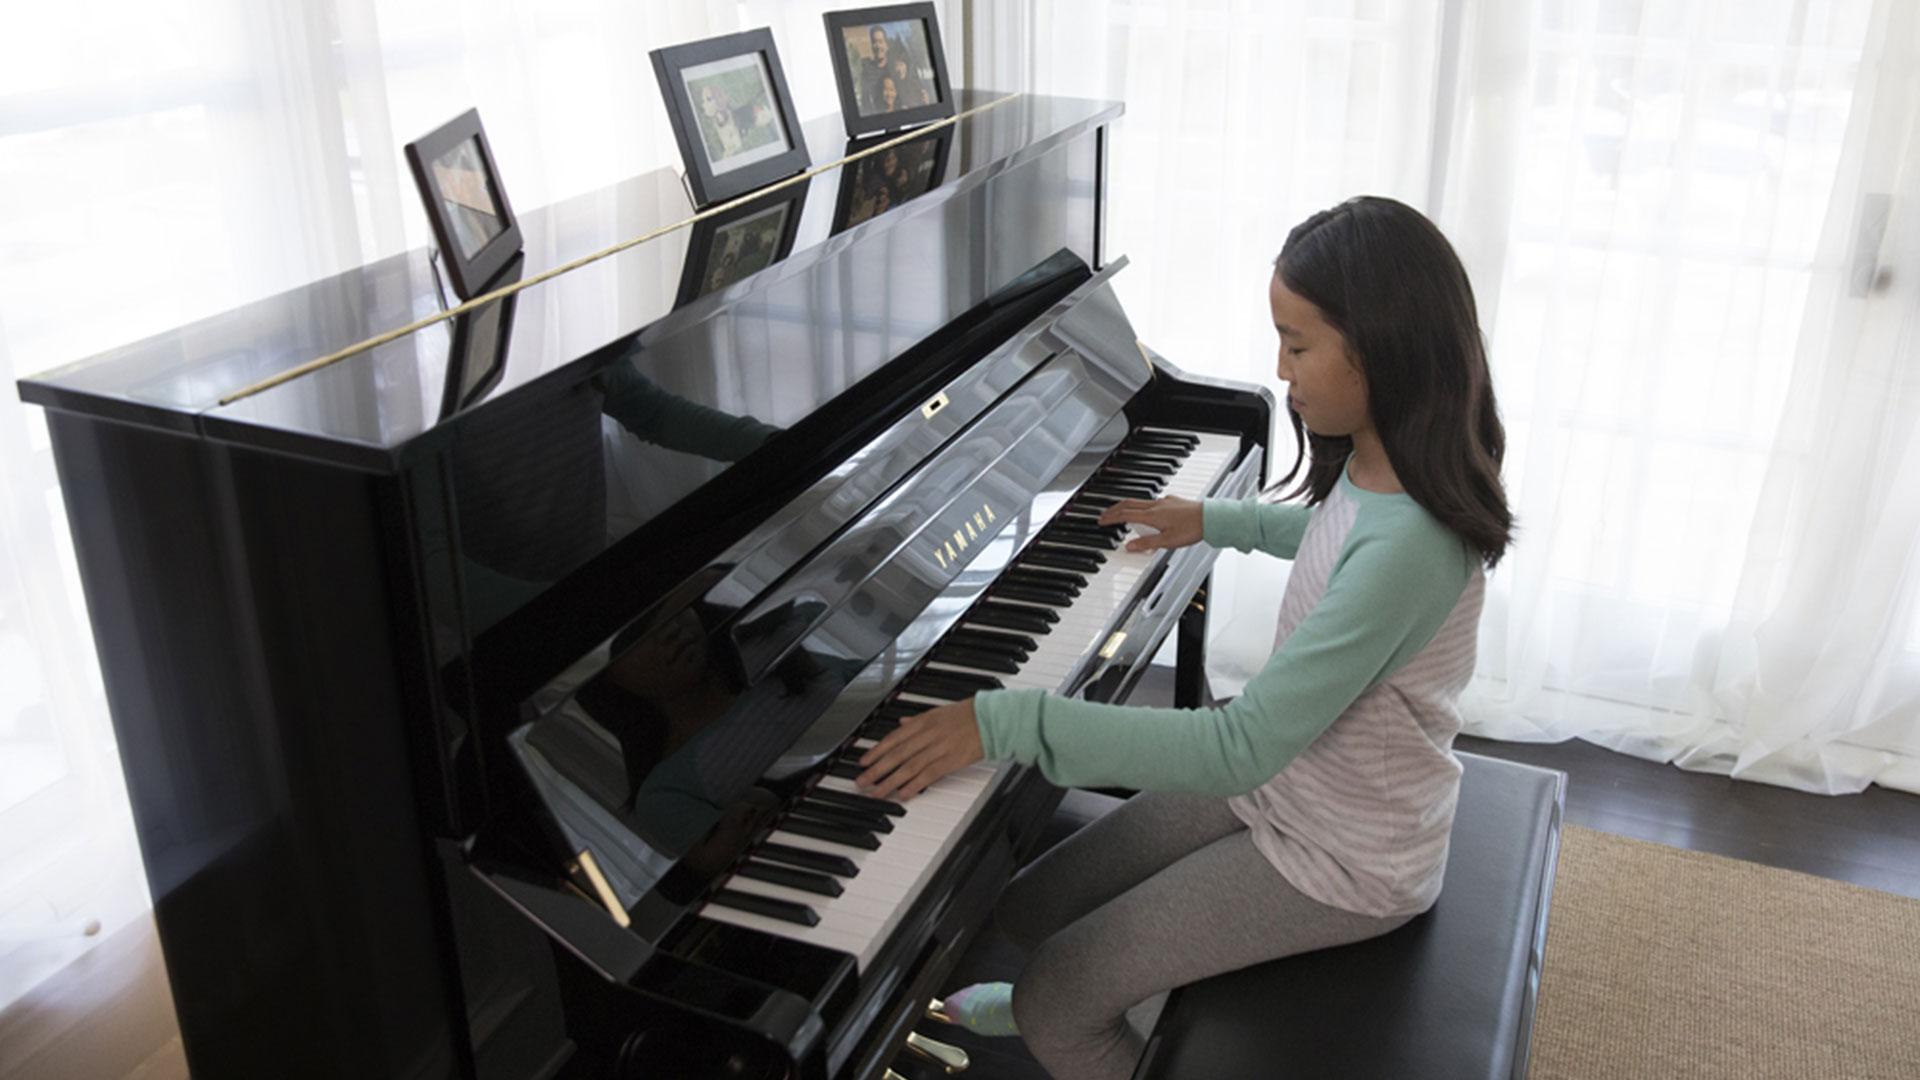 Yamaha U1 Studio Upright Piano   Riverton Piano in Peoria, AZ